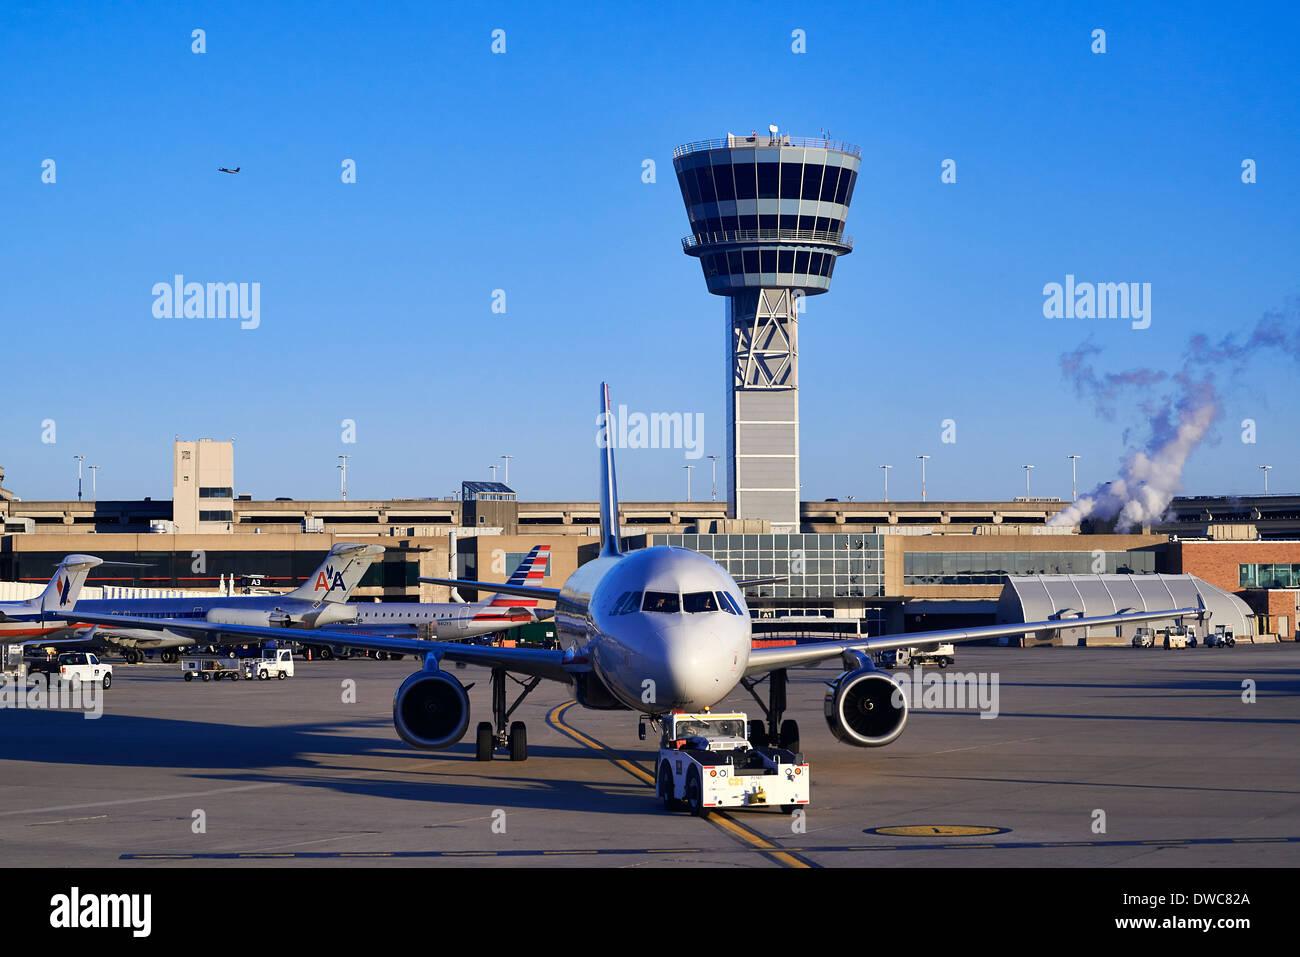 Terminal and control tower at Philadelphia airport, Pennsylvania, USA - Stock Image